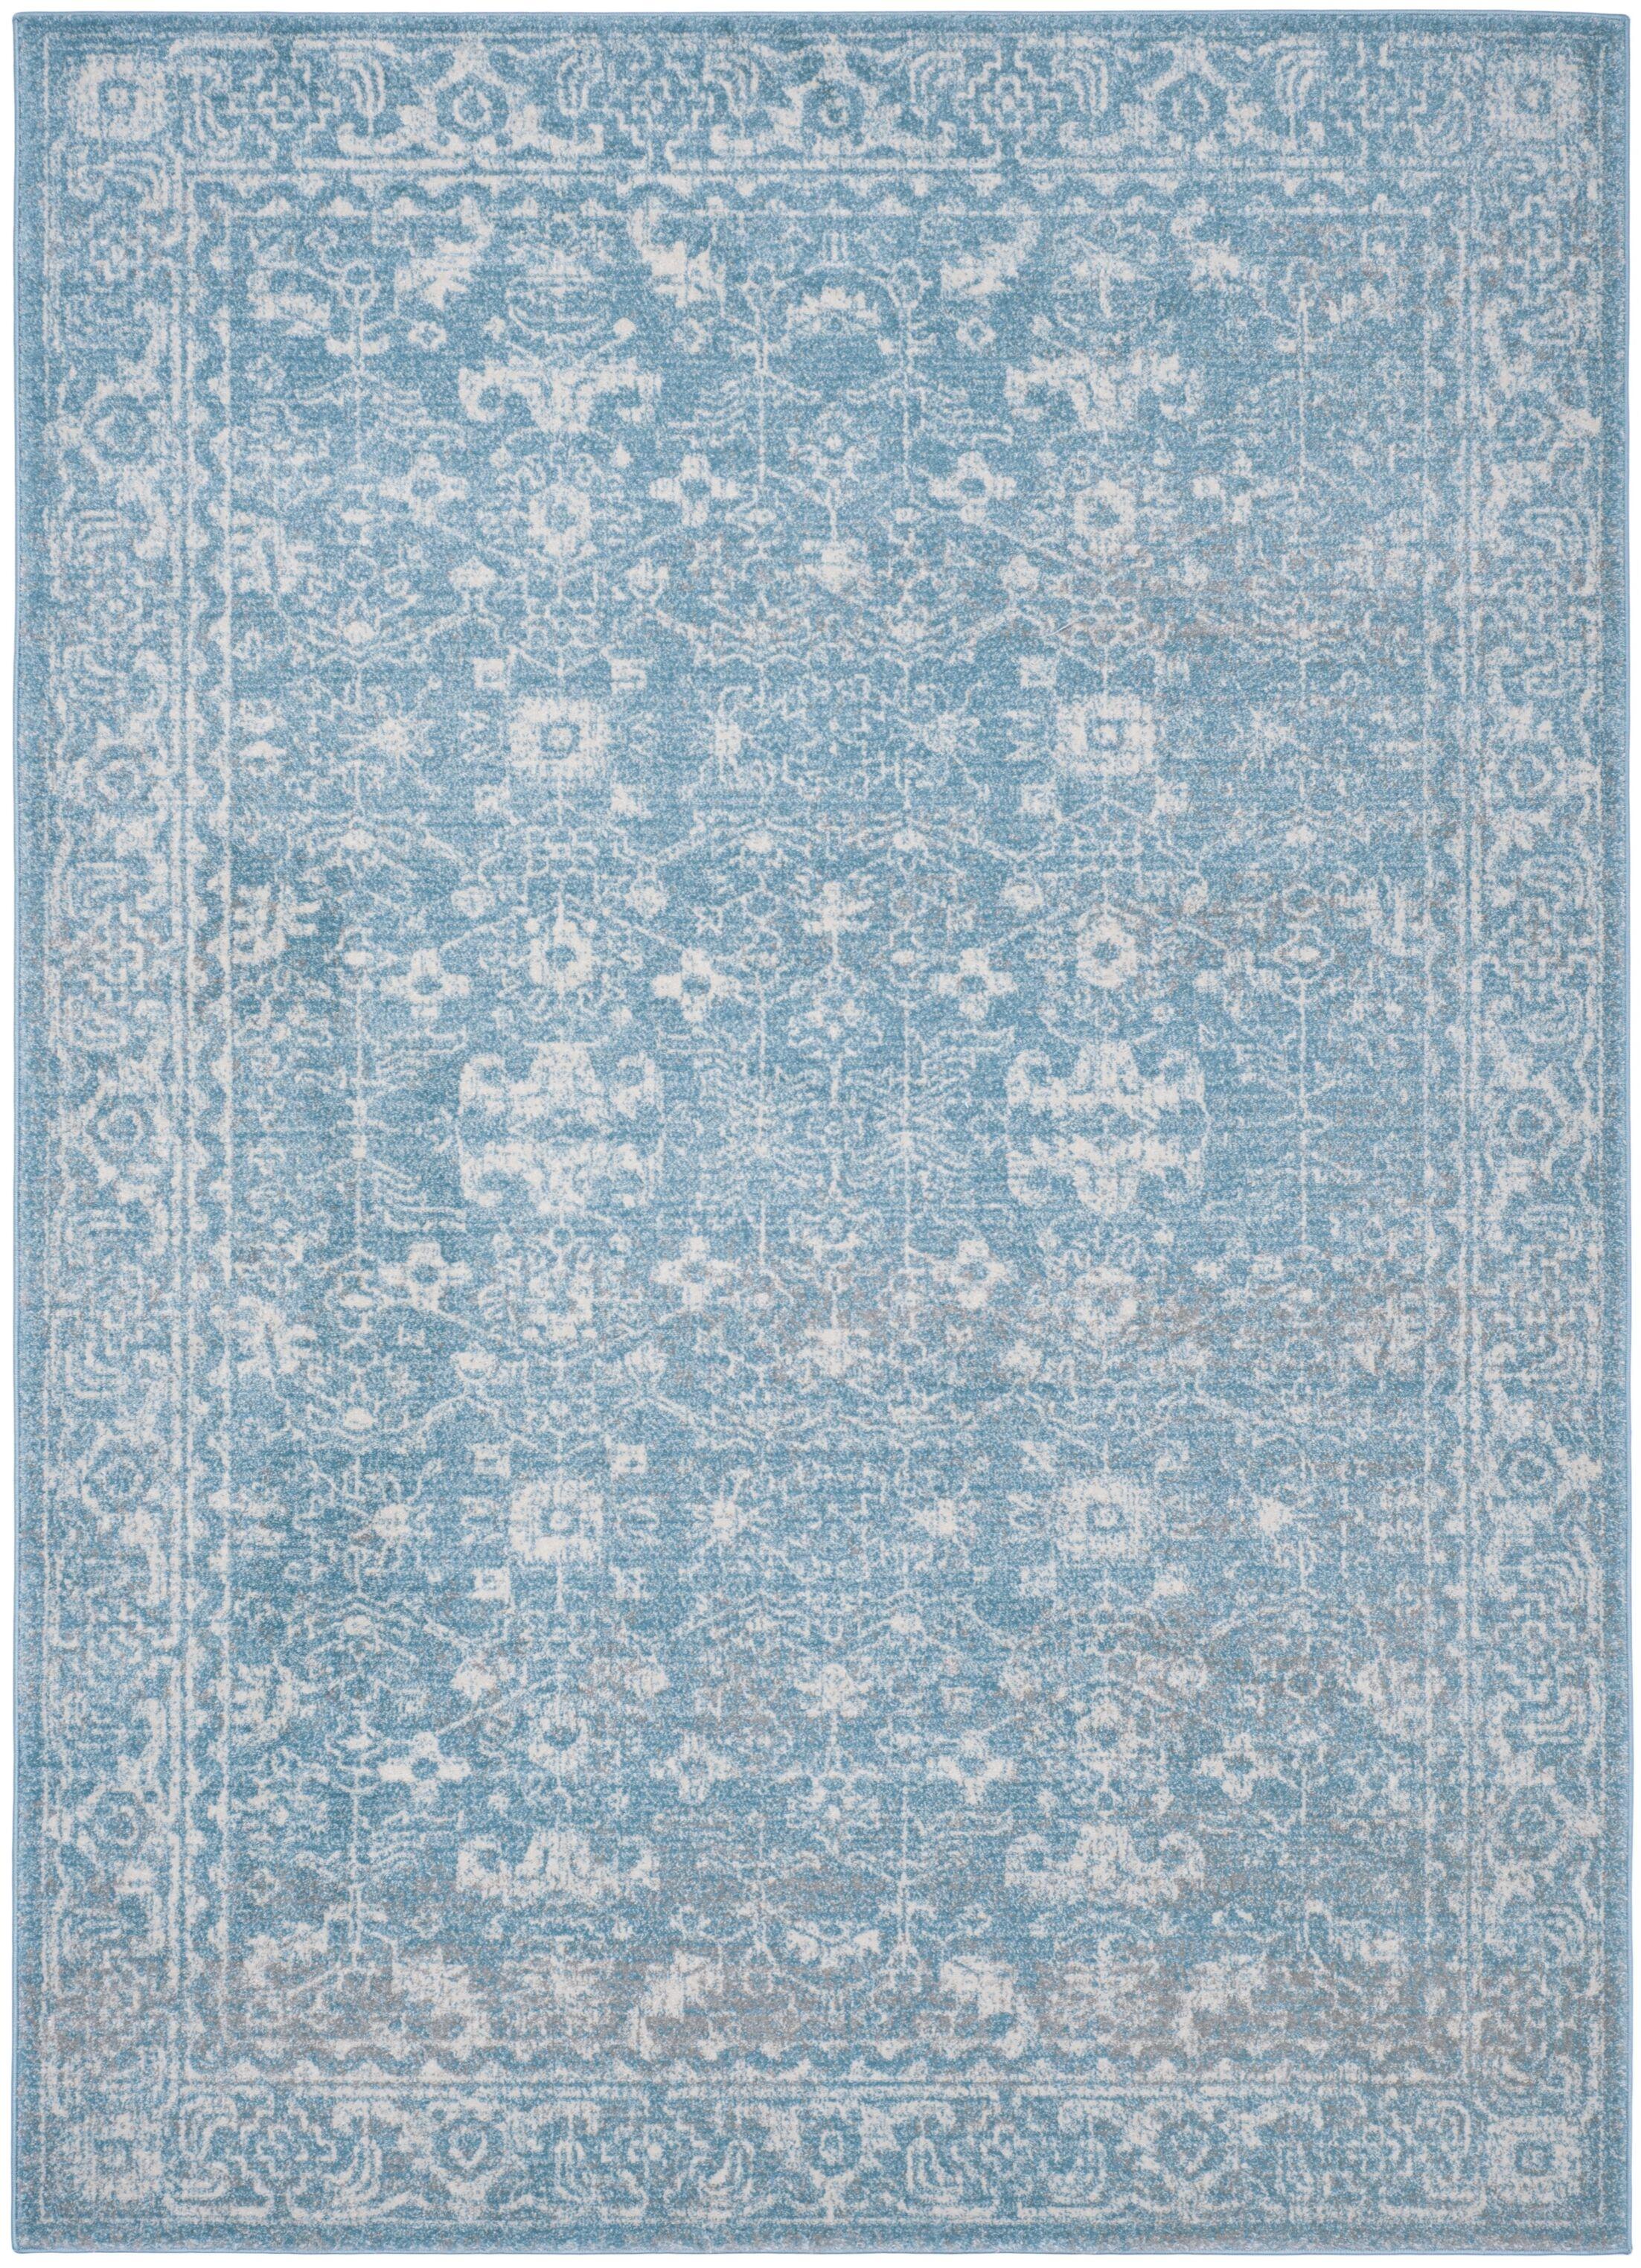 Melia Light Blue/Ivory Area Rug Rug Size: Rectangle 5'1